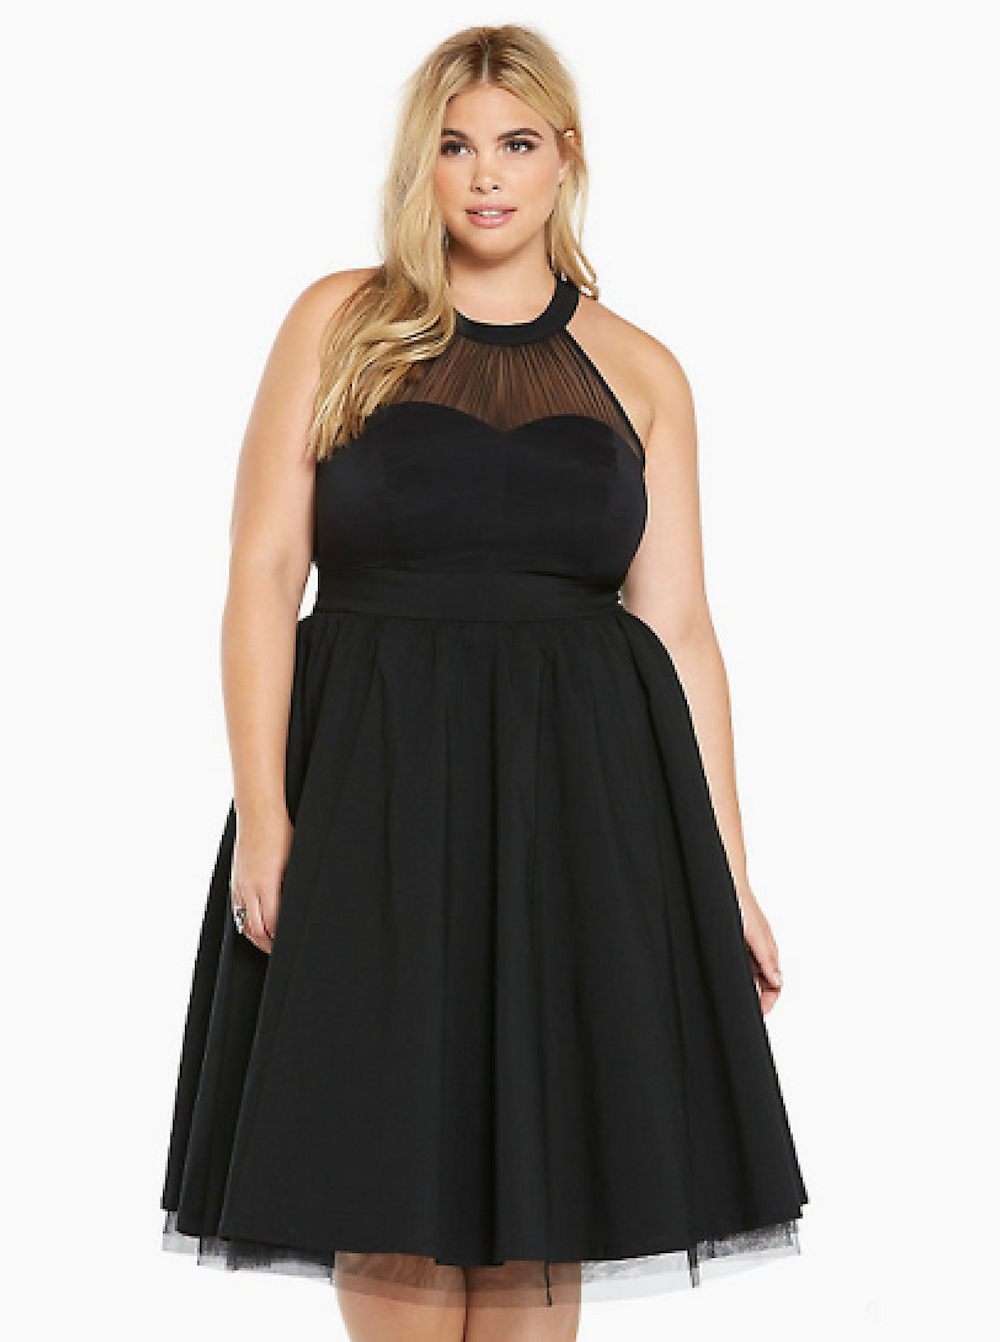 Black dress jcpenney - Black Dress Jcpenney 51